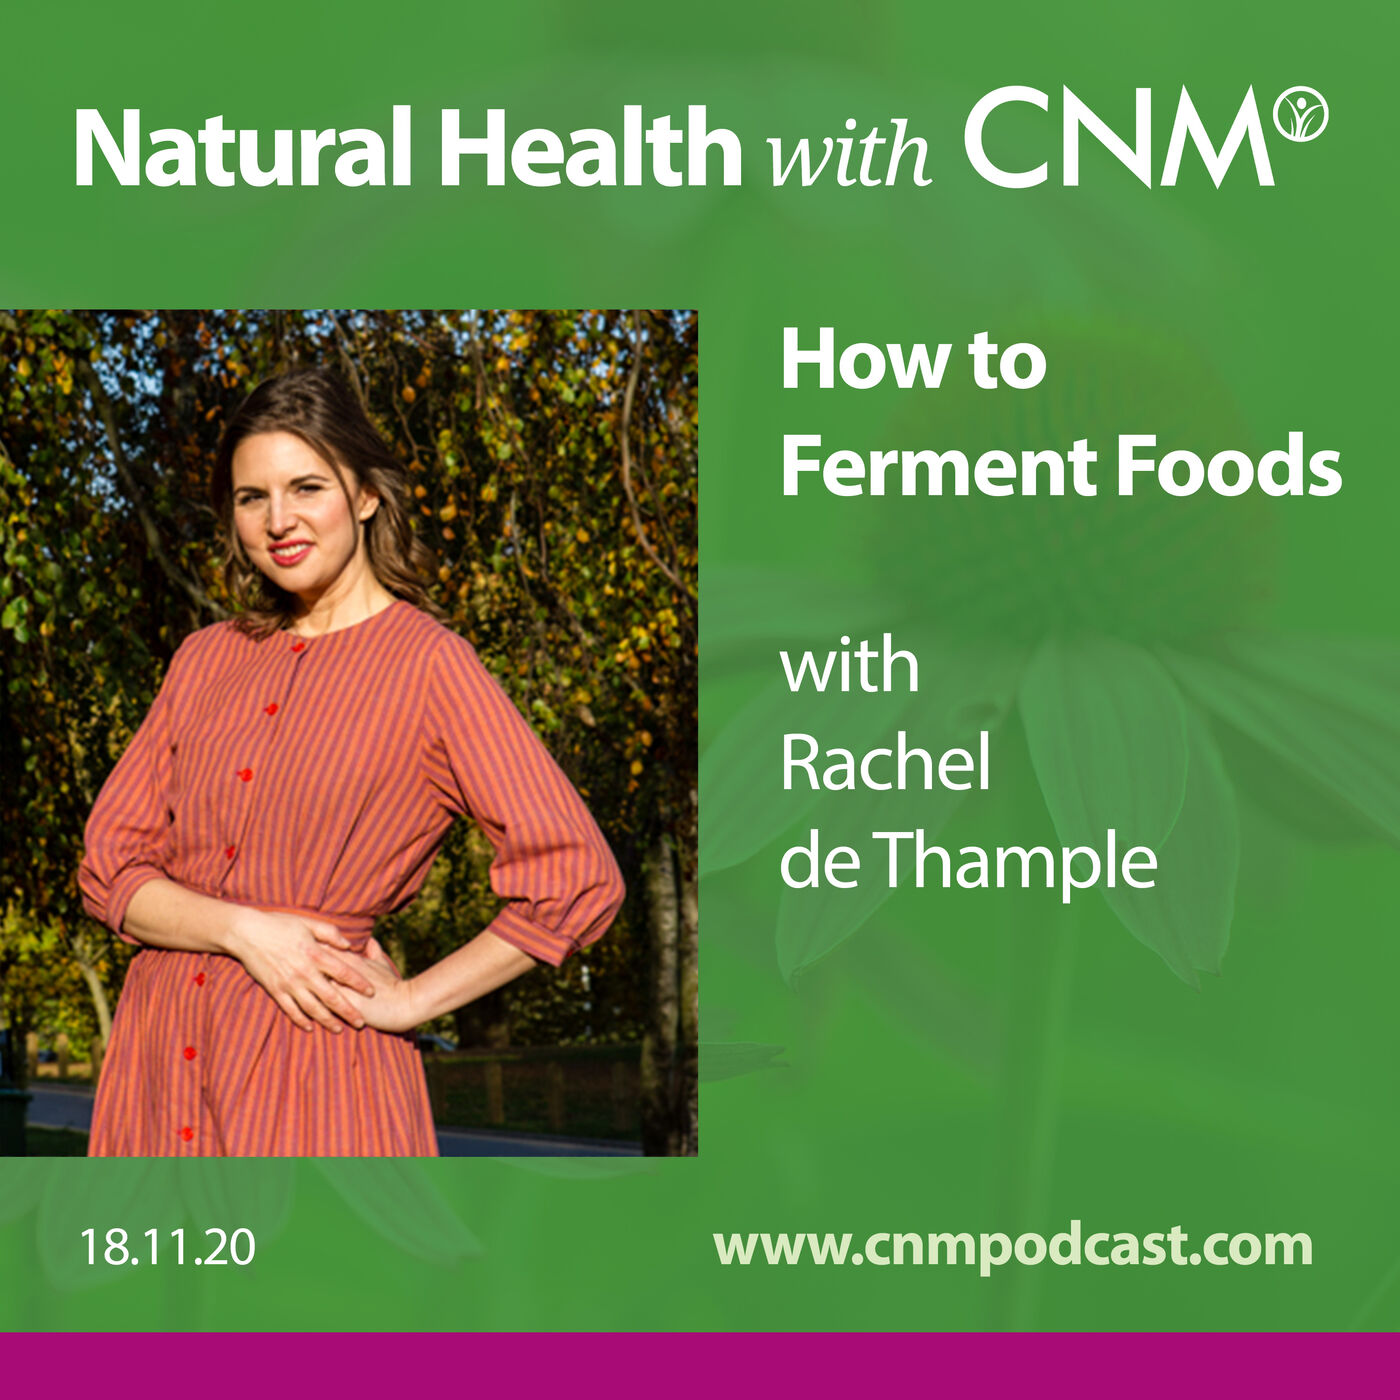 How to Ferment Foods with Rachel de Thample